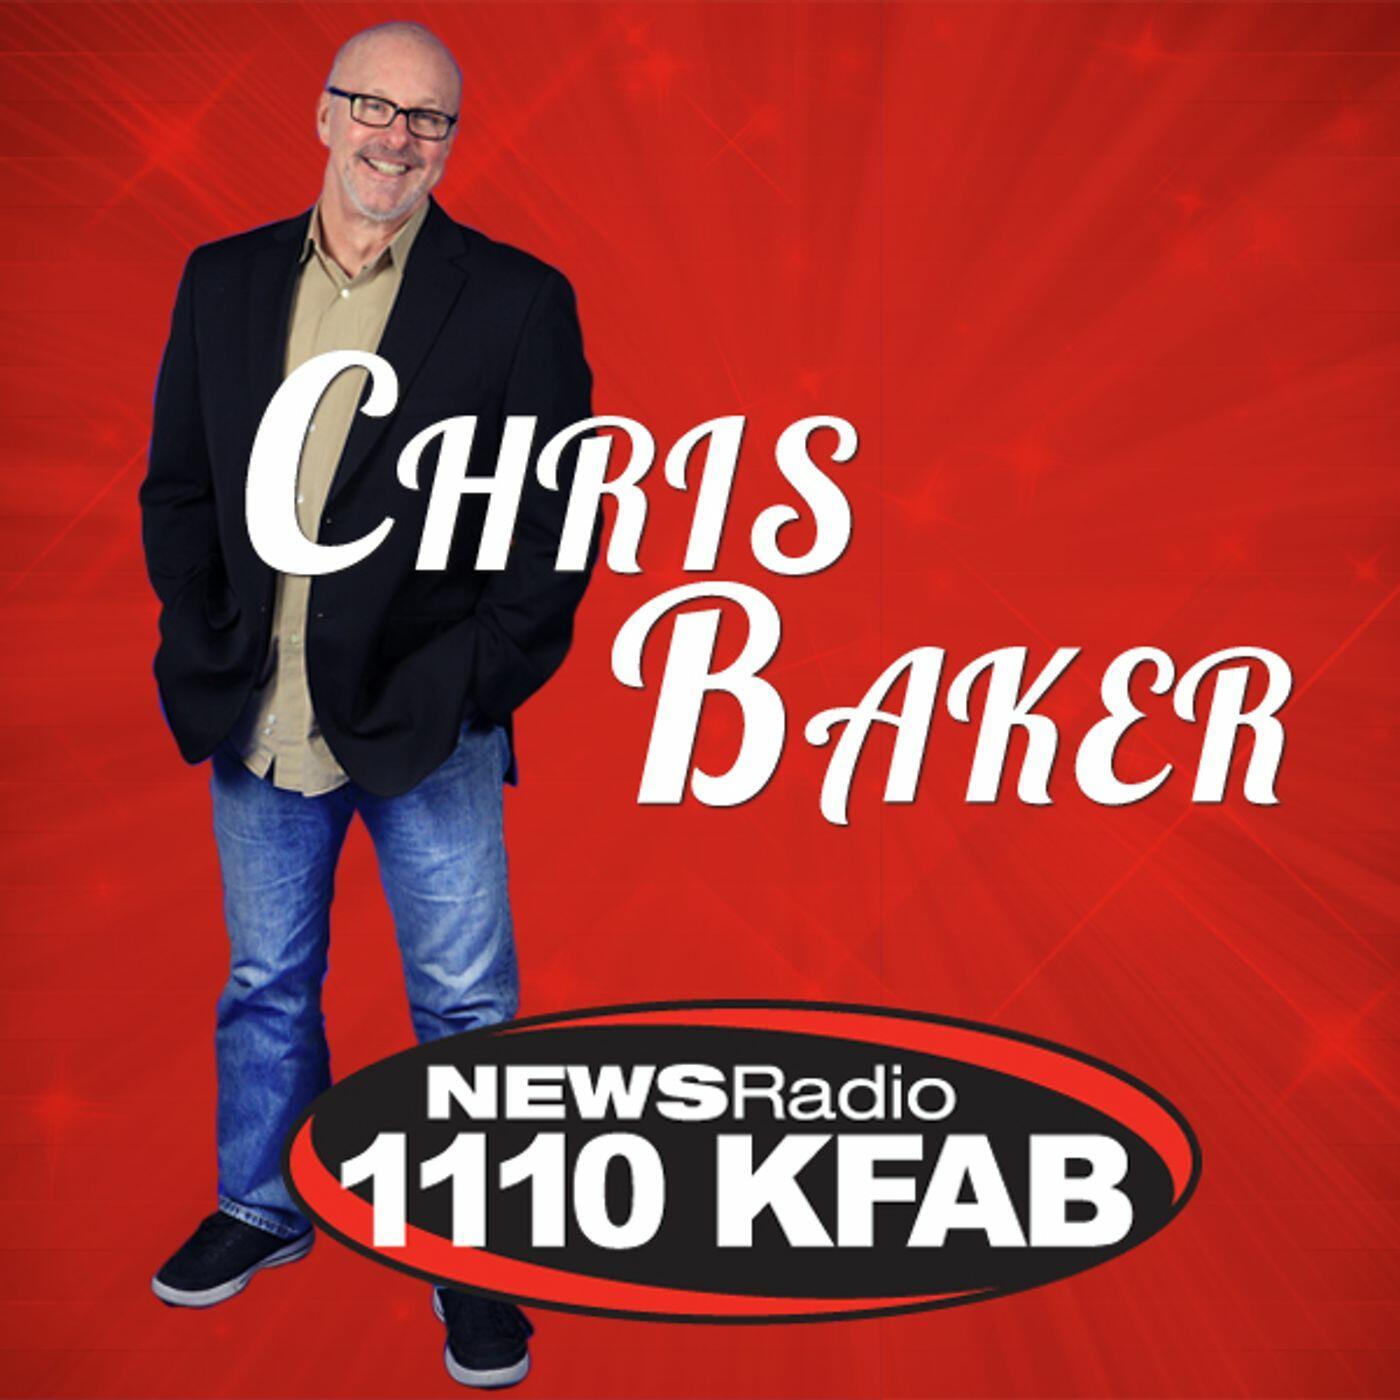 Listen to the Chris Baker Episode - CWS: Auburn Pitcher Tanner Burns on iHeartRadio | iHeartRadio